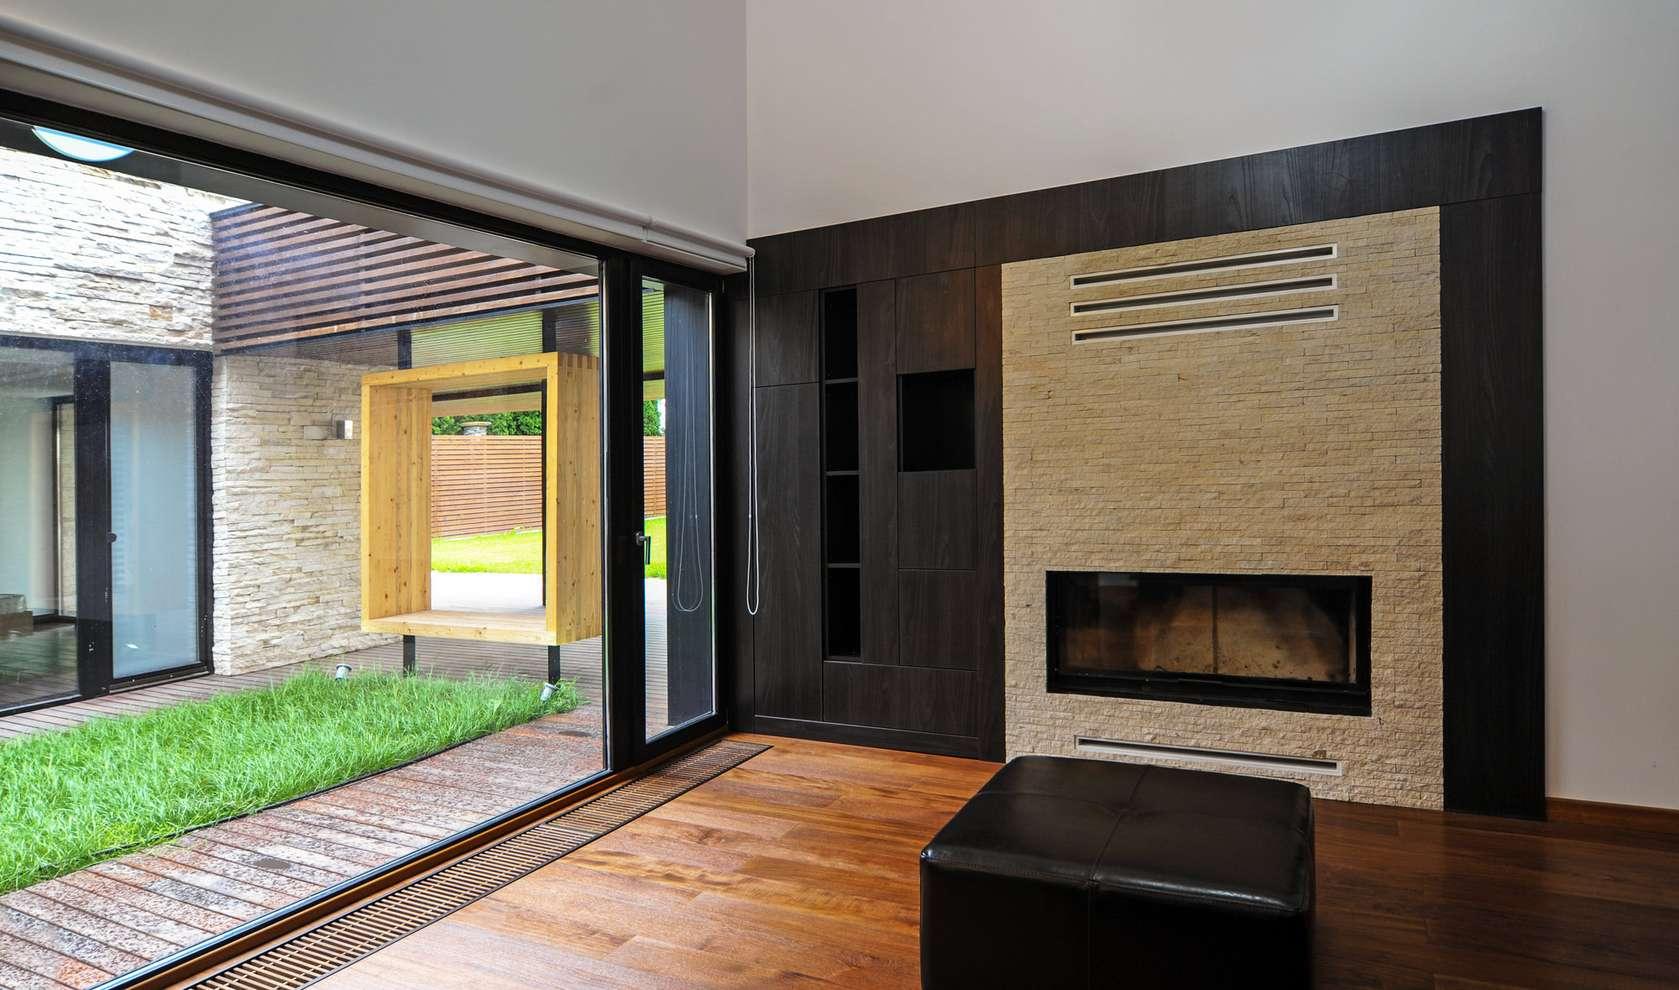 Chimeneas en pisos awesome casa con chimenea carrer costa - Chimeneas para pisos ...